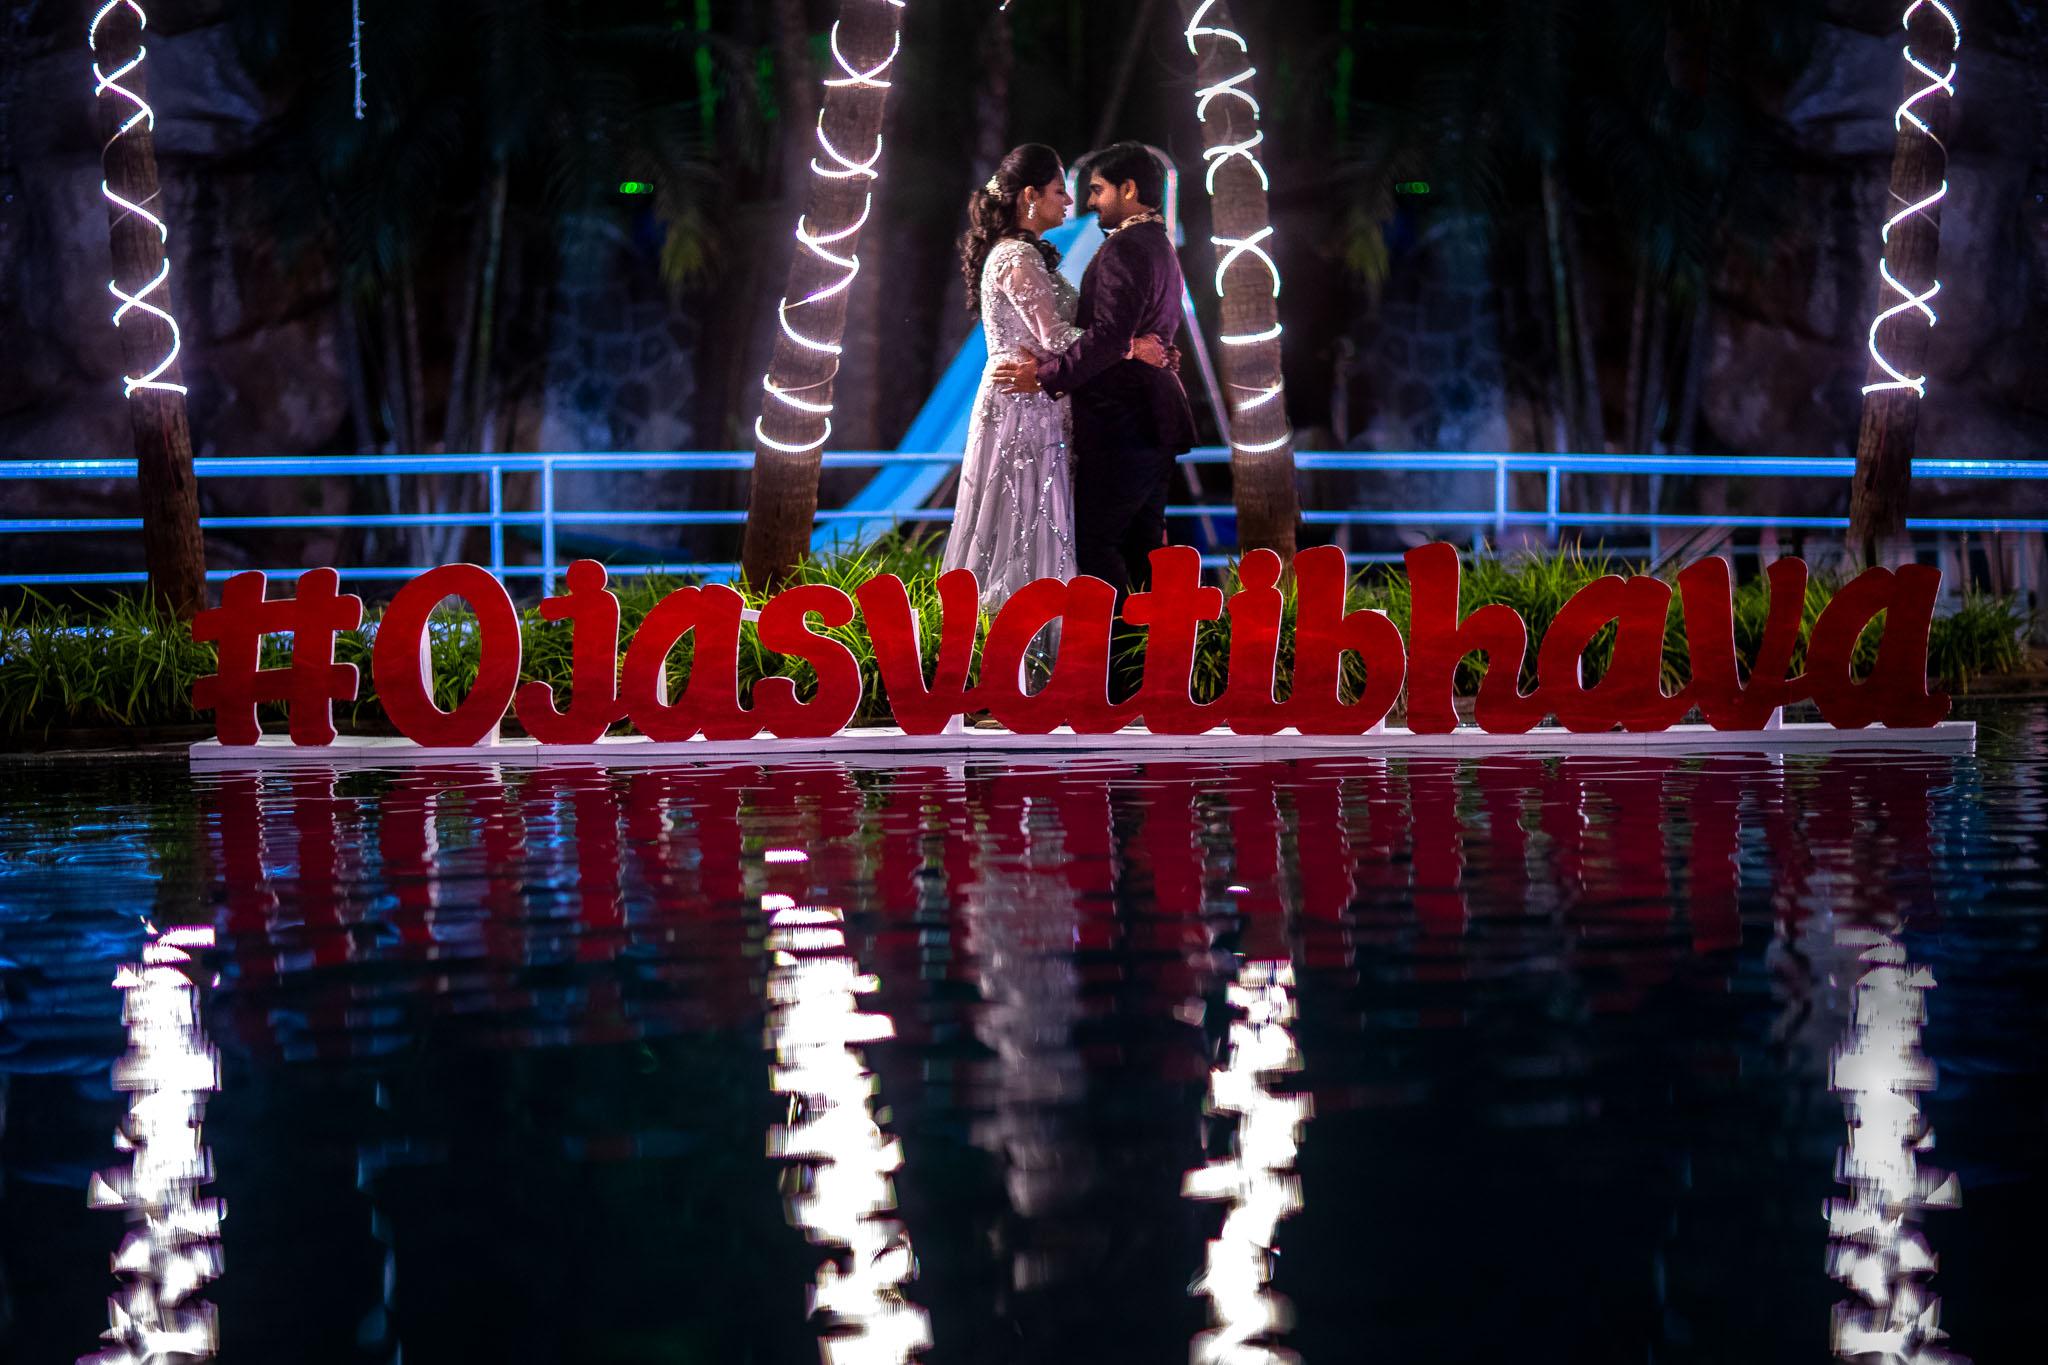 Mukti x Ojas Wedding Akshjay Sansare Photography Best wedding photographer in mumbai India Candid Cinematic Films videos-15.jpg